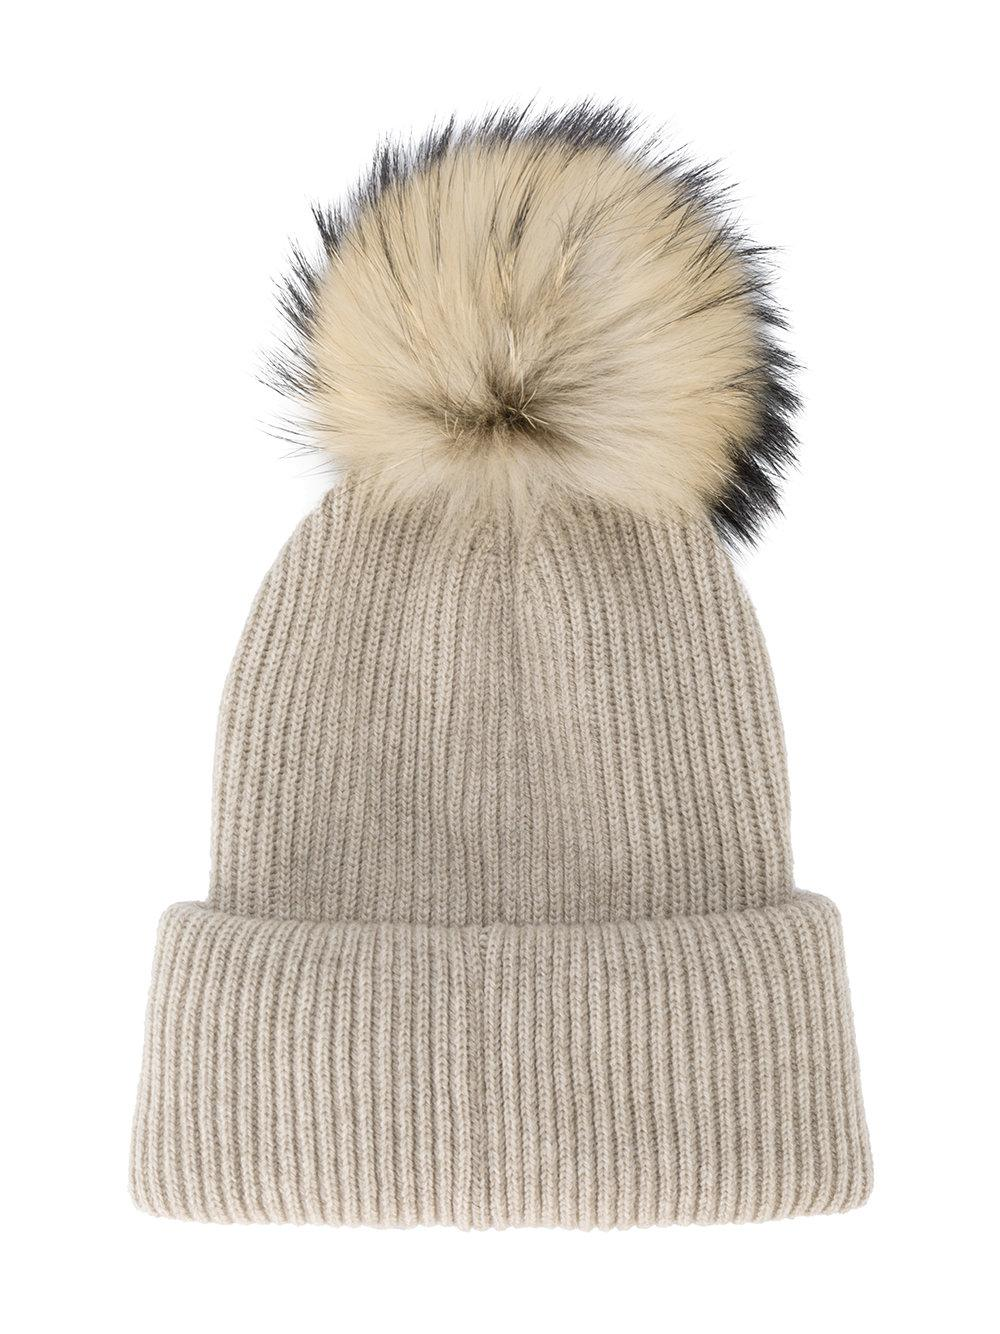 Neutral Ribbed Cashmere Hat with Visor and Fur Pom Pom inverni Ka4YtCrd